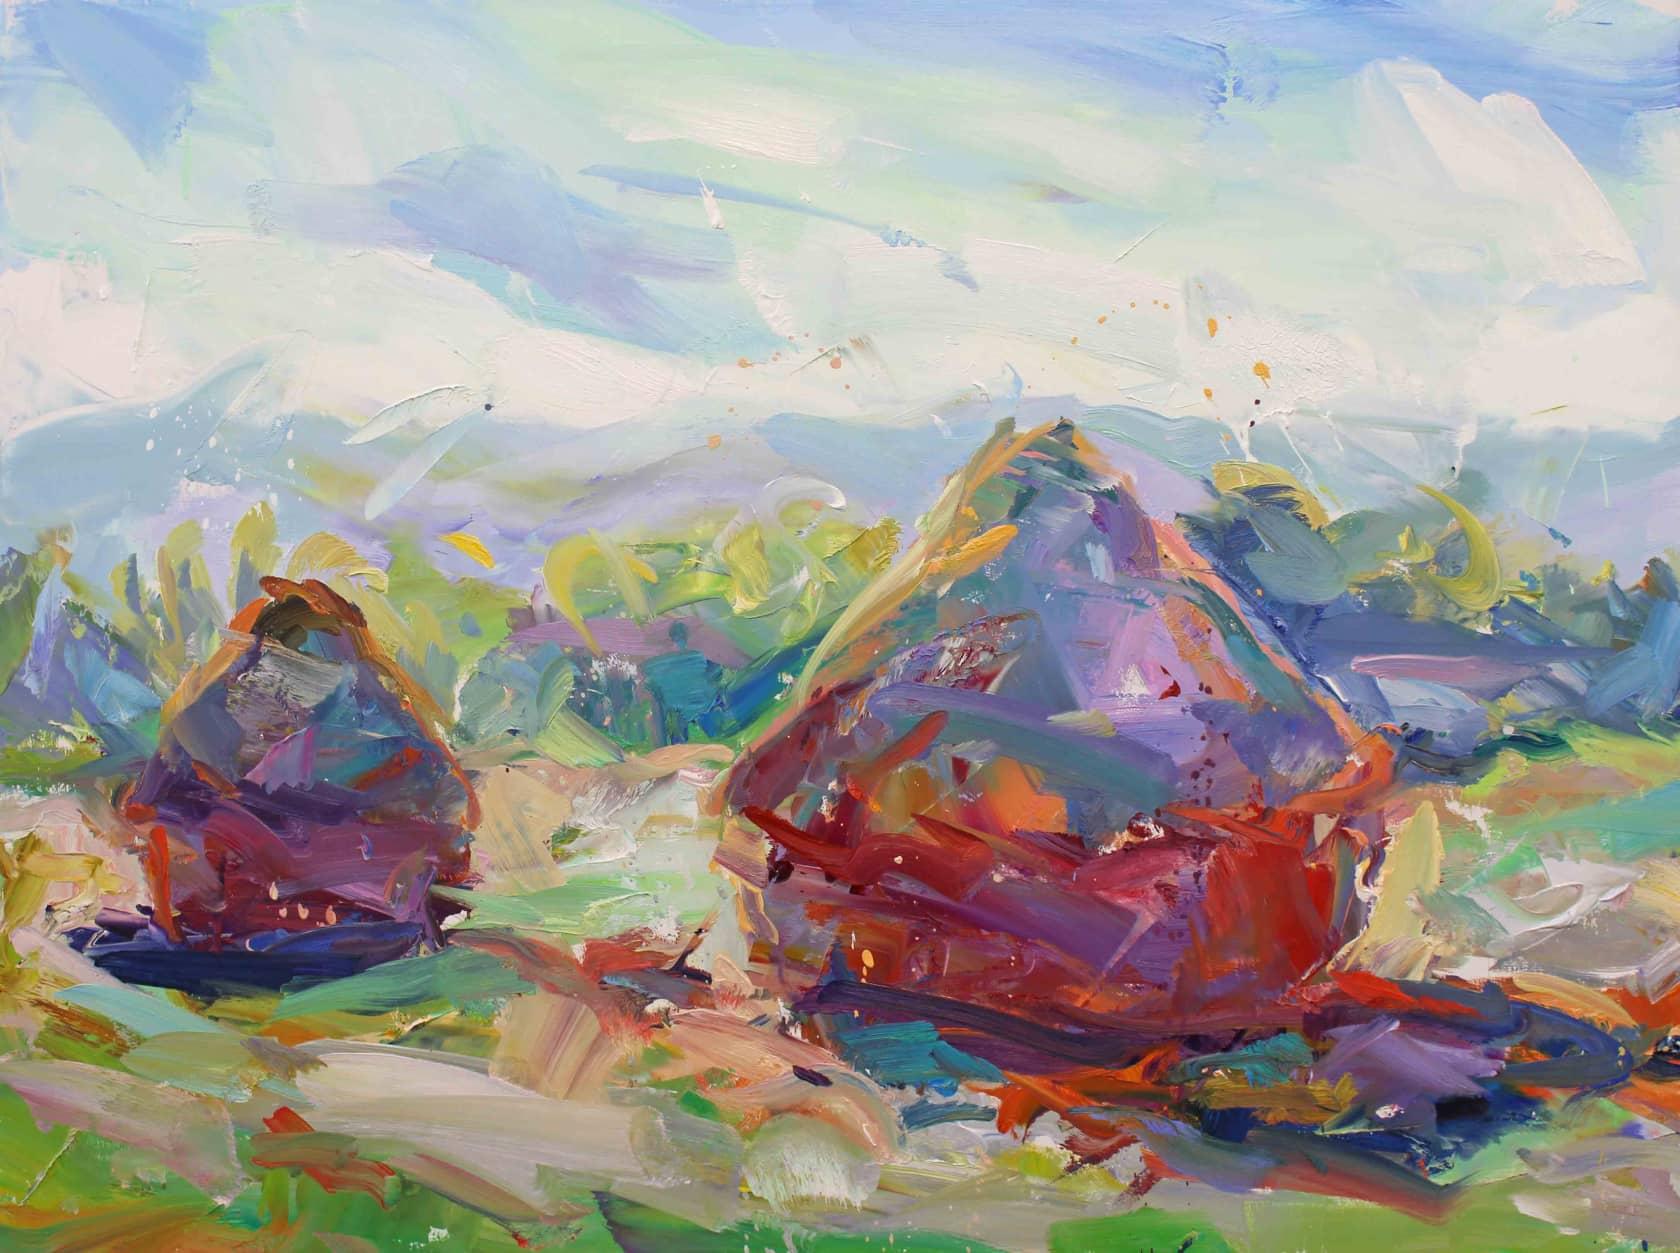 Paul Wright, Haystacks, 2017